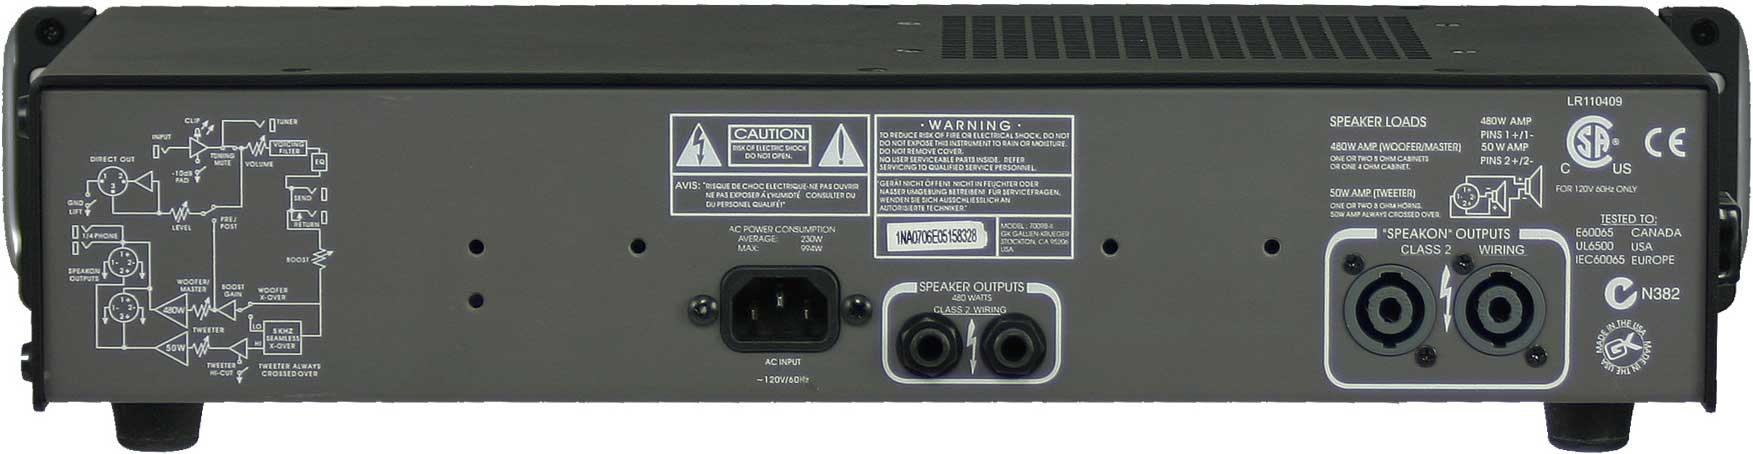 gallien krueger 700rb ii 480w bass amplifier head with 50w horn bi amp system full compass. Black Bedroom Furniture Sets. Home Design Ideas